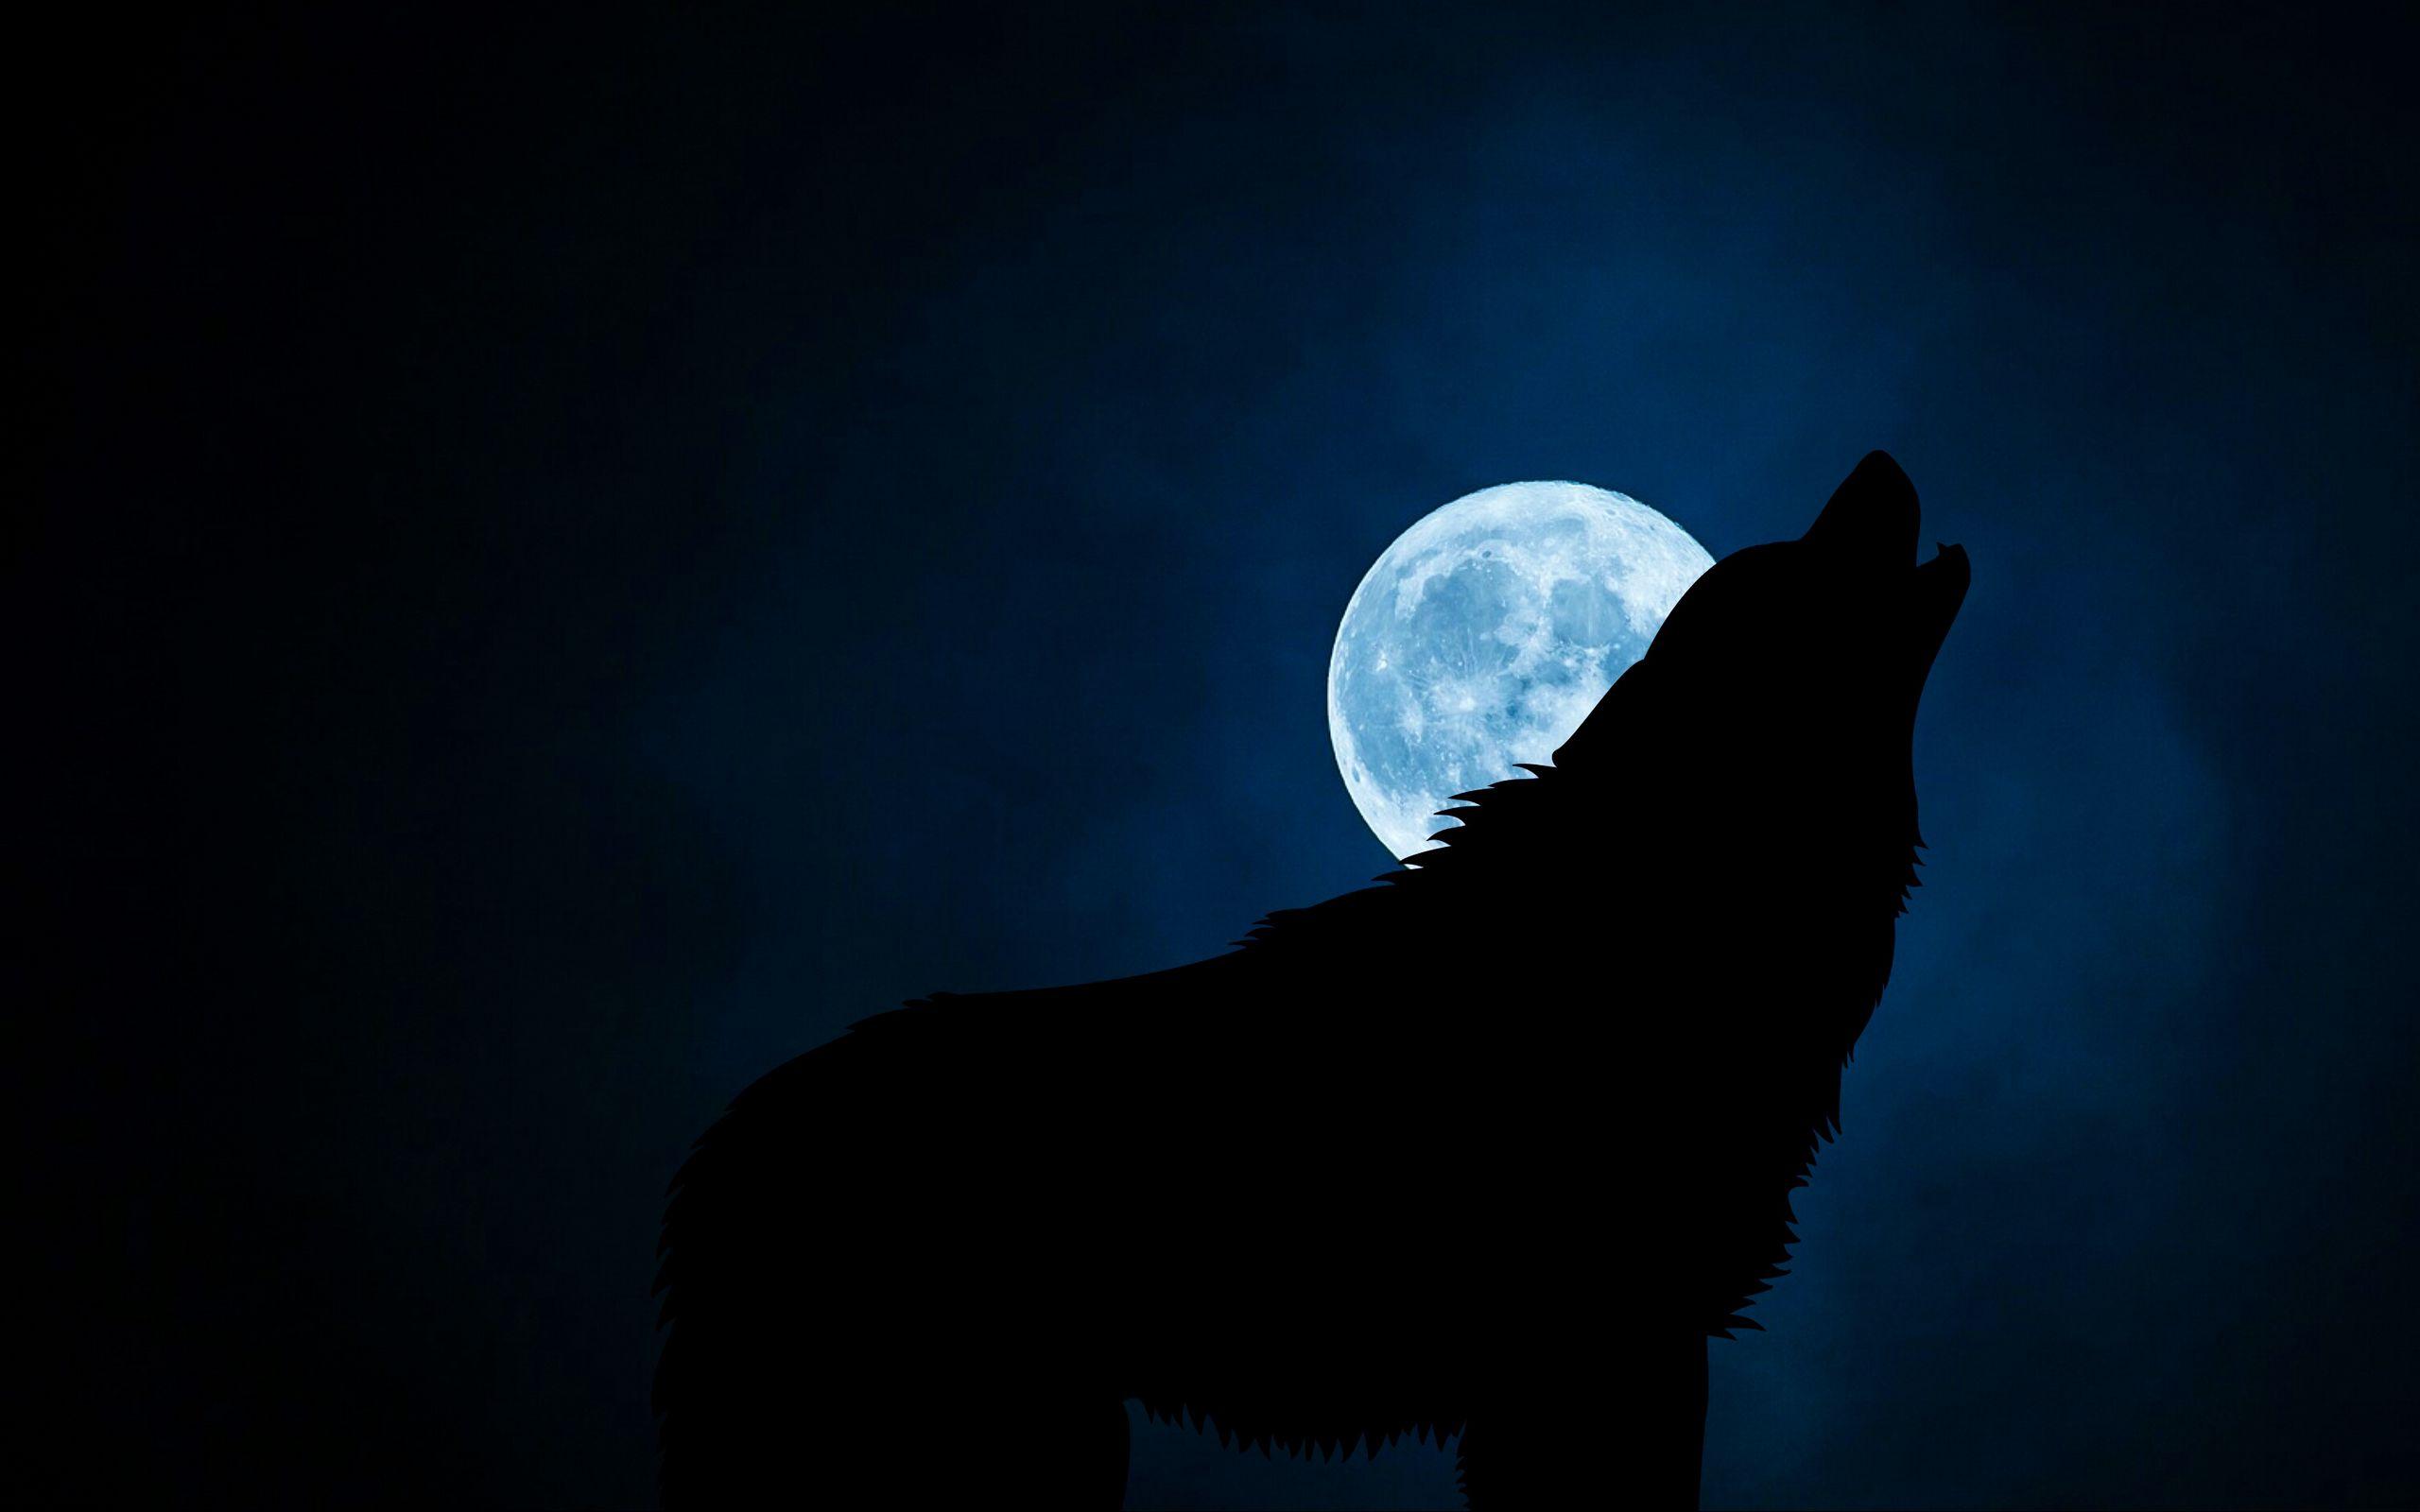 2560x1600 Wallpaper wolf, silhouette, moon, night